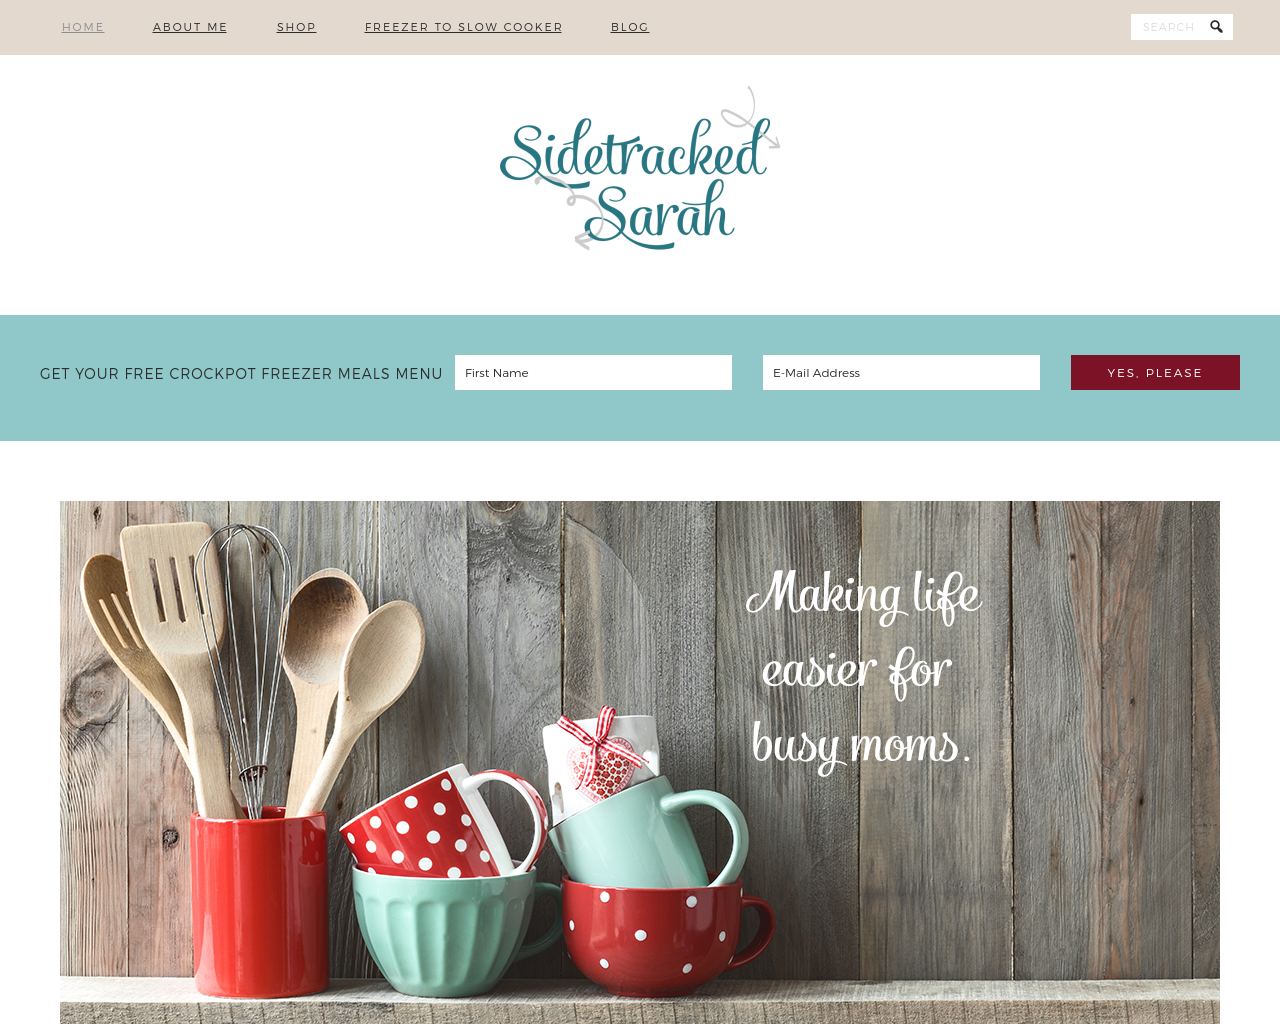 Sidetracked-Sarah-Advertising-Reviews-Pricing